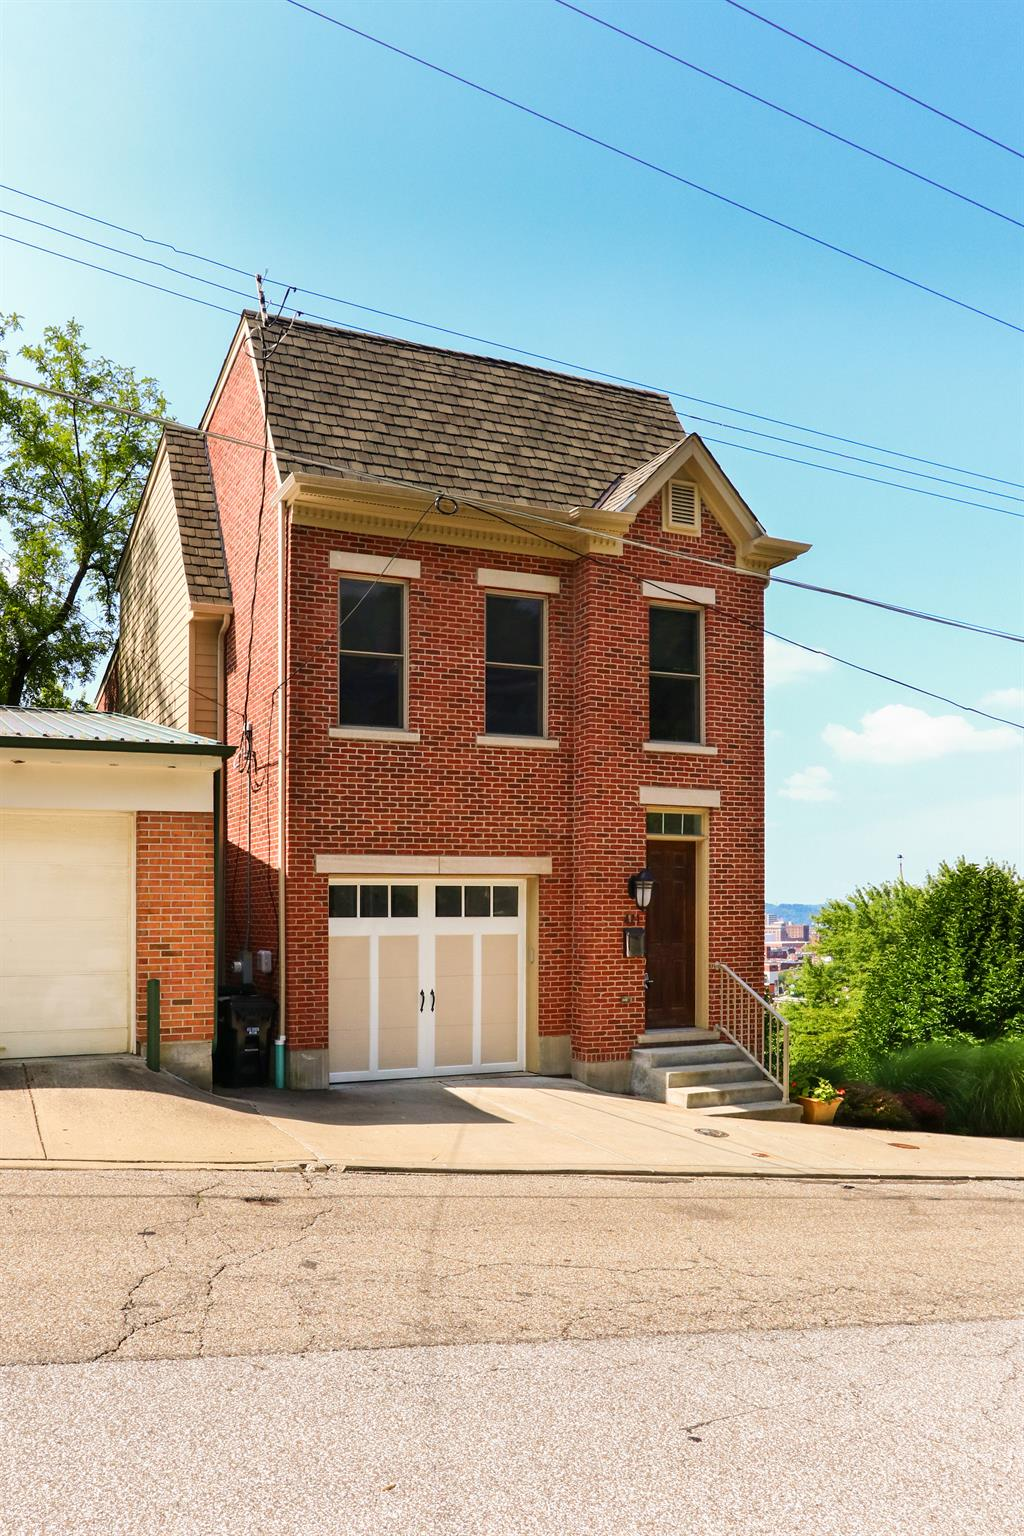 Exterior (Main) 2 for 421 Boal St Mt. Auburn, OH 45202